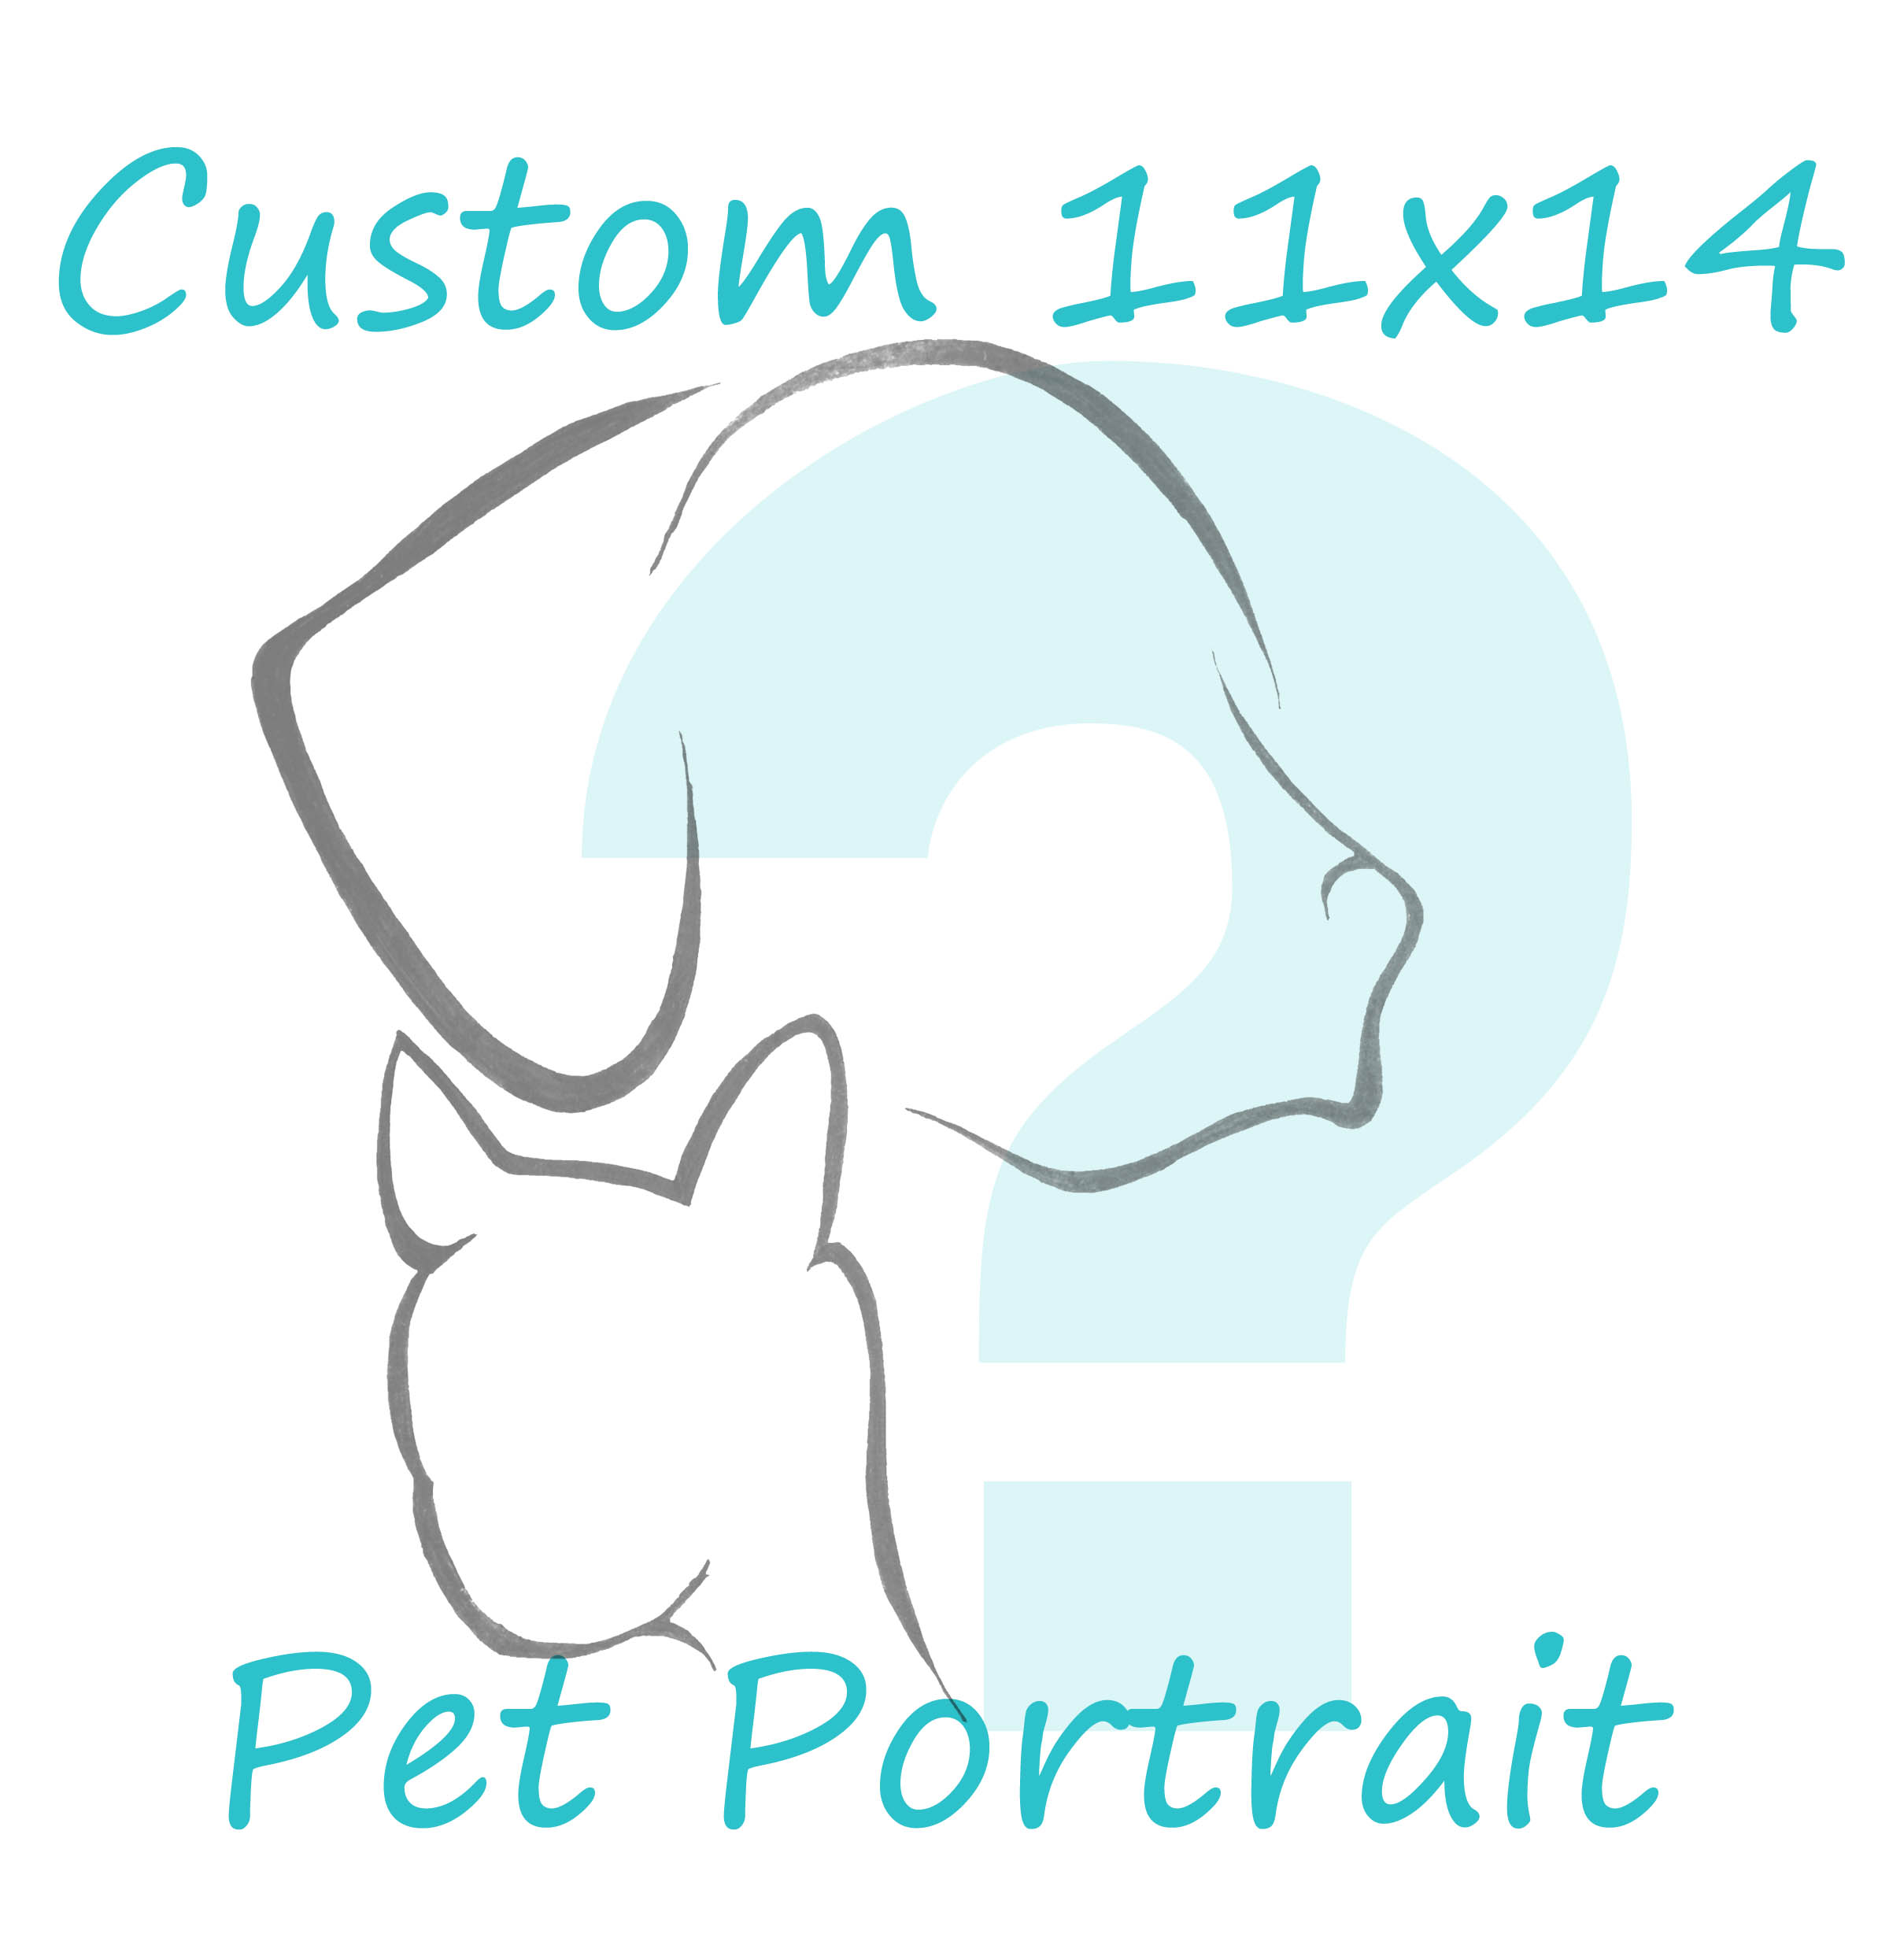 custom 11x14 pet portrait